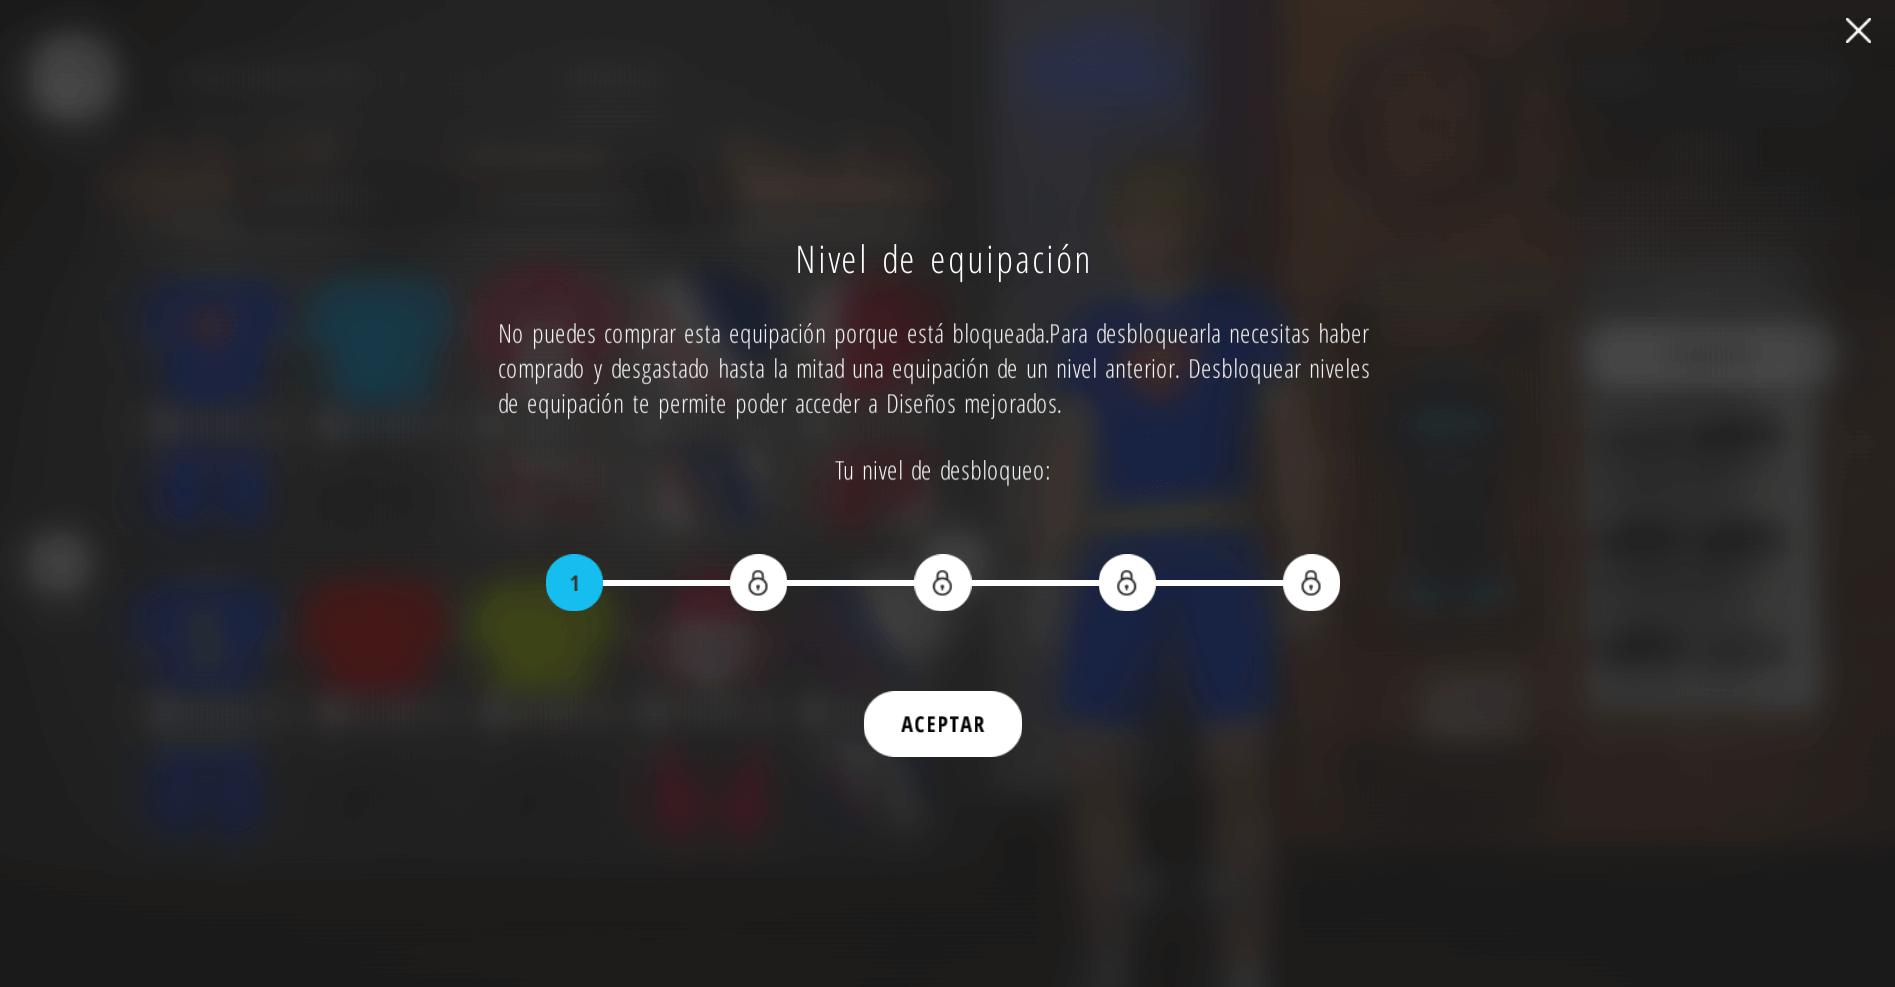 Niveles equipación Simulador Bkool